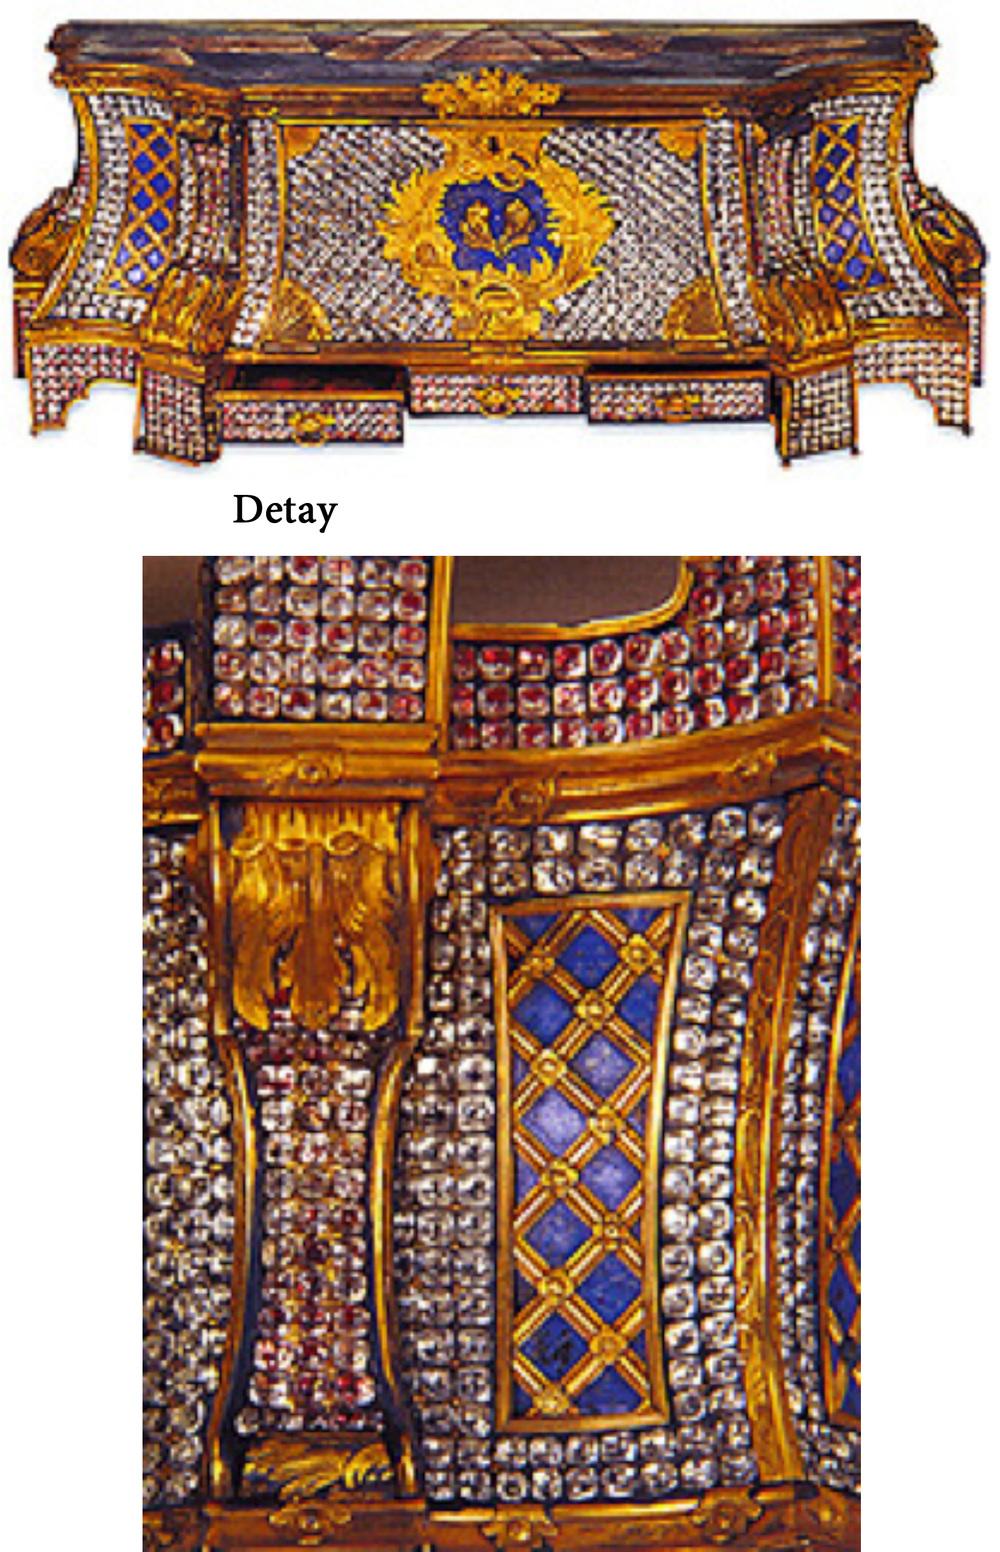 Pirinç-Altın Mücevher Çekmecesi, 32x20x16 cm, Env. no. T.S.M. 2/789.